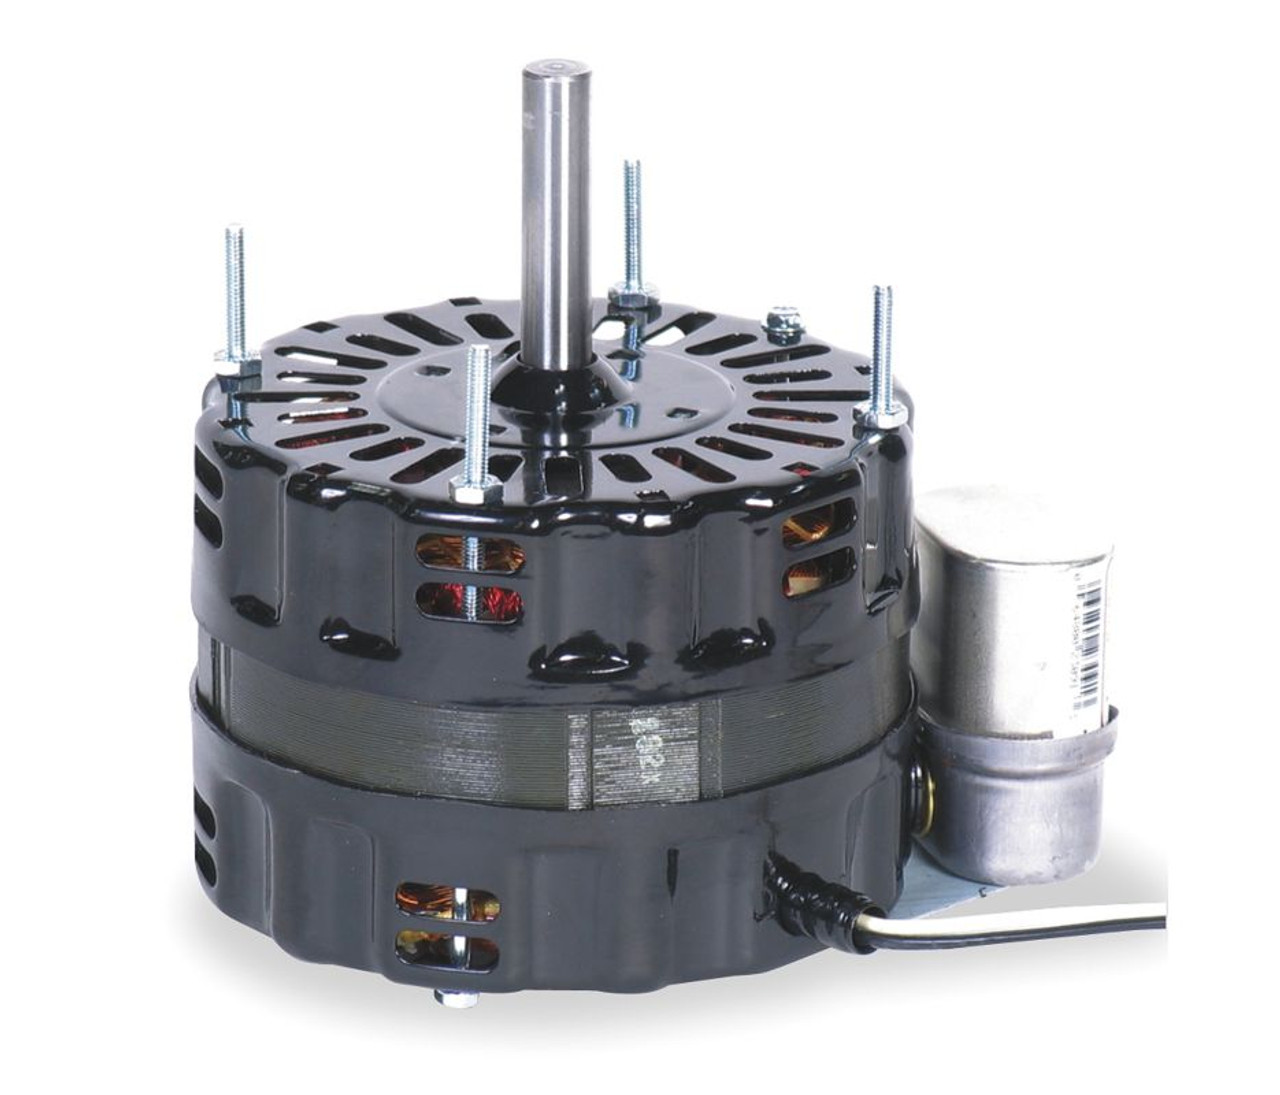 Dayton Unit Heater Motor A0820B2843 1/4 hp 1050 RPM 4.2 amps 120V Model on